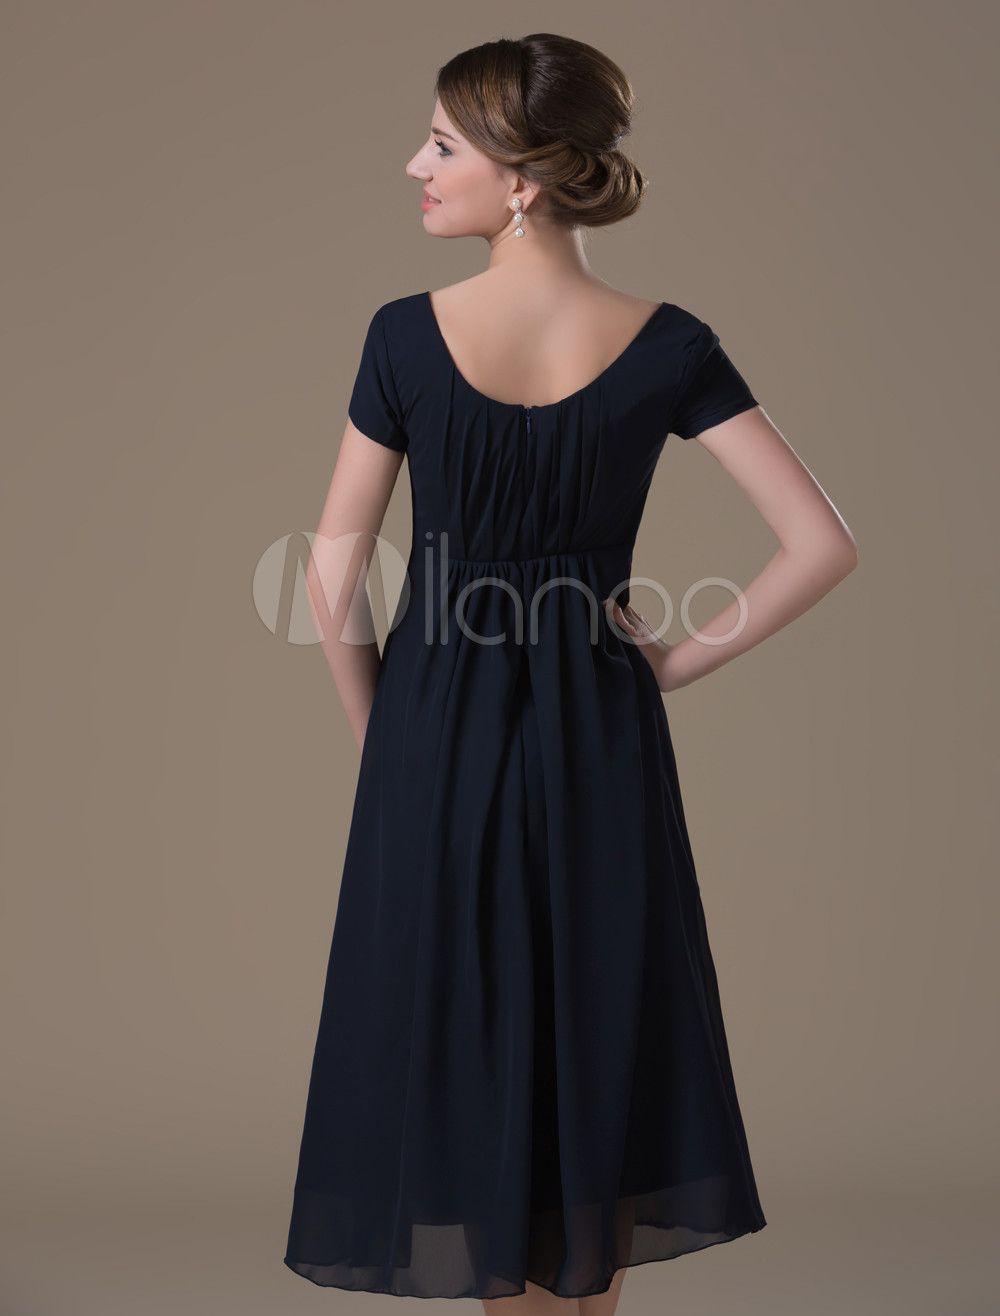 2d44e4328f A-line Dark Navy Chiffon Maternity Bridesmaid Dress with Jewel Neck High  Rise Waist